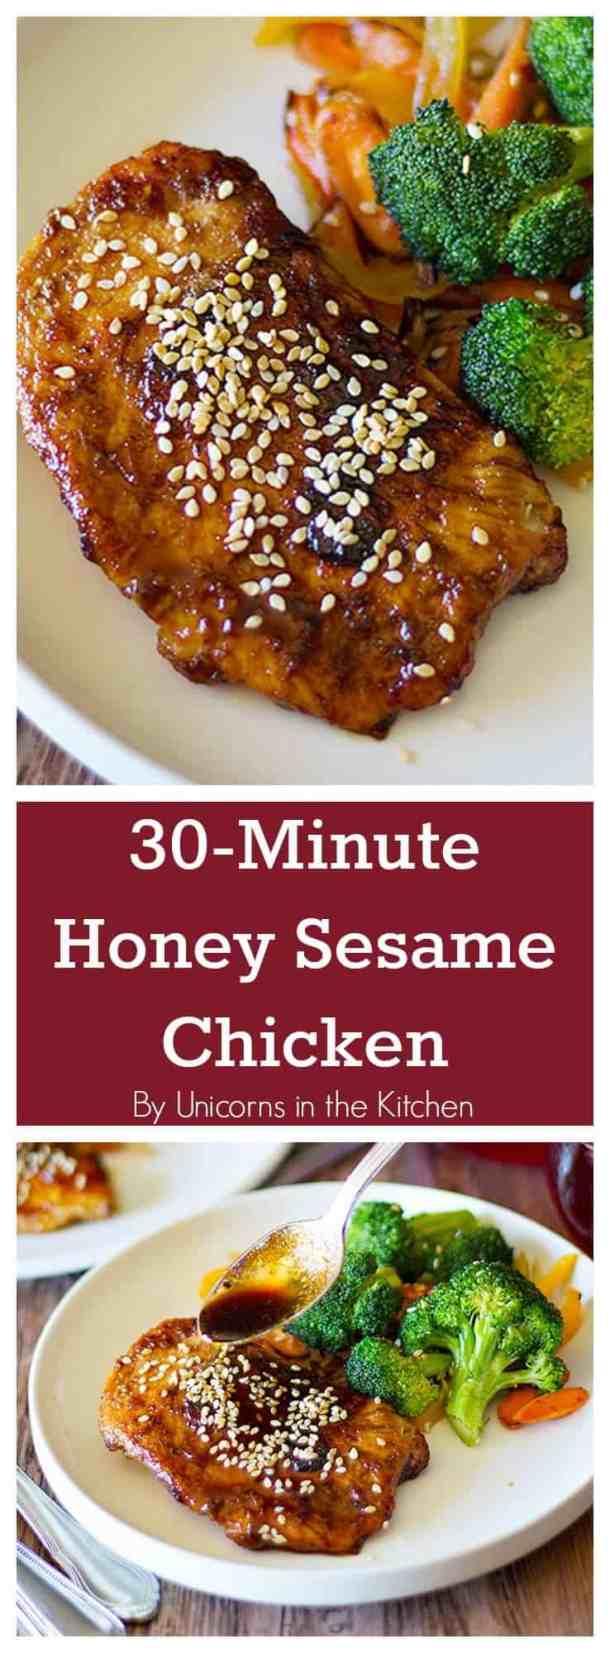 Honey Sesame Chicken | Honey Sesame Chicken Recipe | Honey Sesame Chicken healthy | Honey Sesame Chicken instant pot | Honey Sesame Chicken crock pot | www.unicornsinthekitchen.com